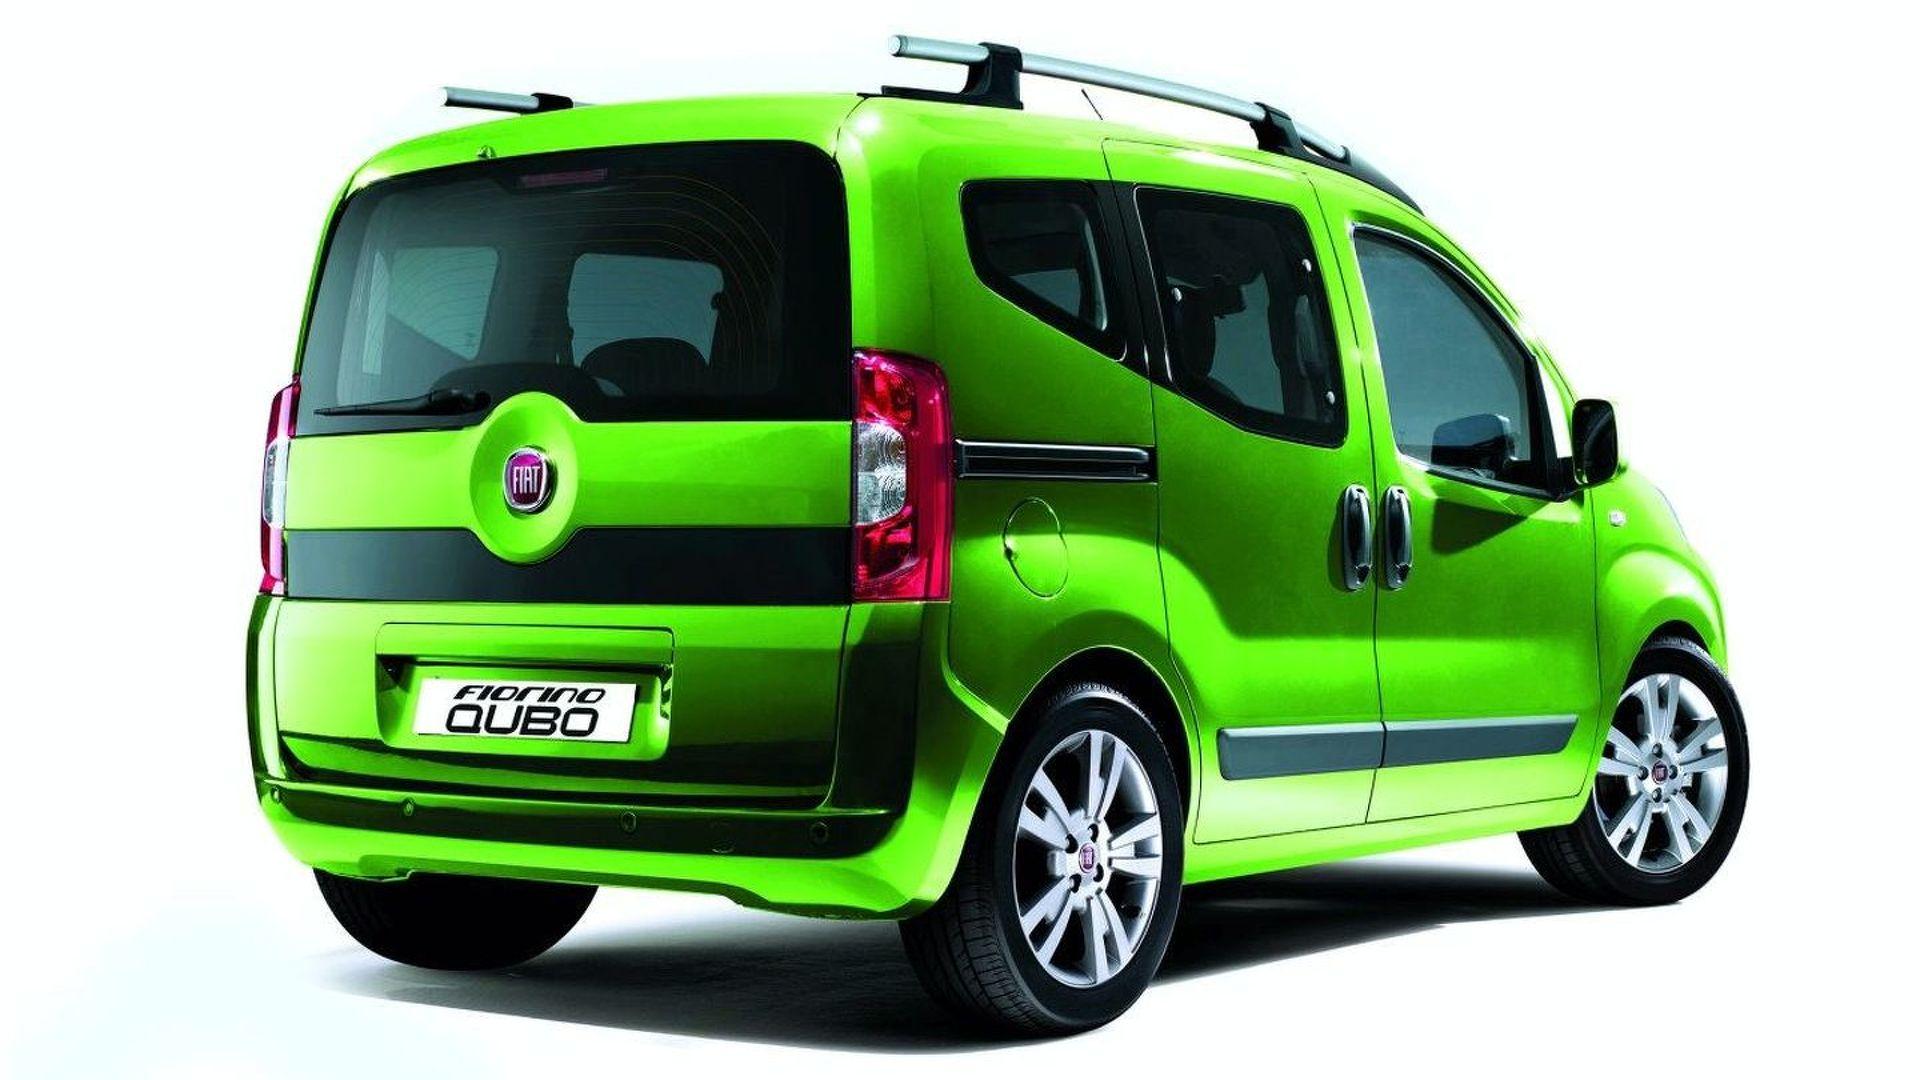 Fiat Fiorino Qubo Revealed